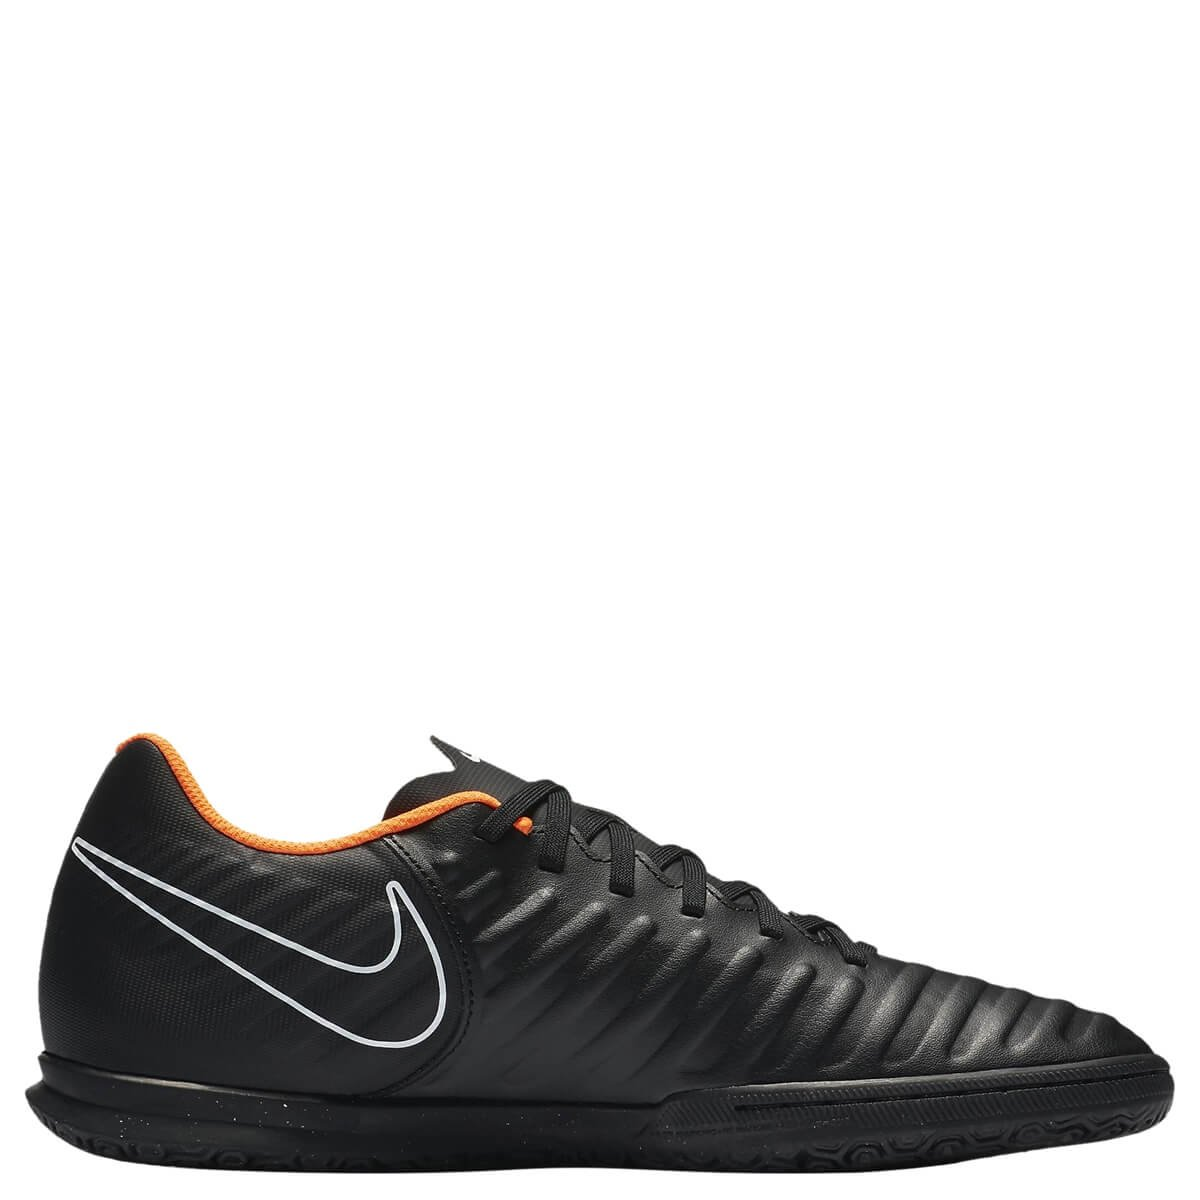 Bizz Store - Chuteira Futsal Masculina Nike TiempoX 7 Legend 7c7ba552d89fe